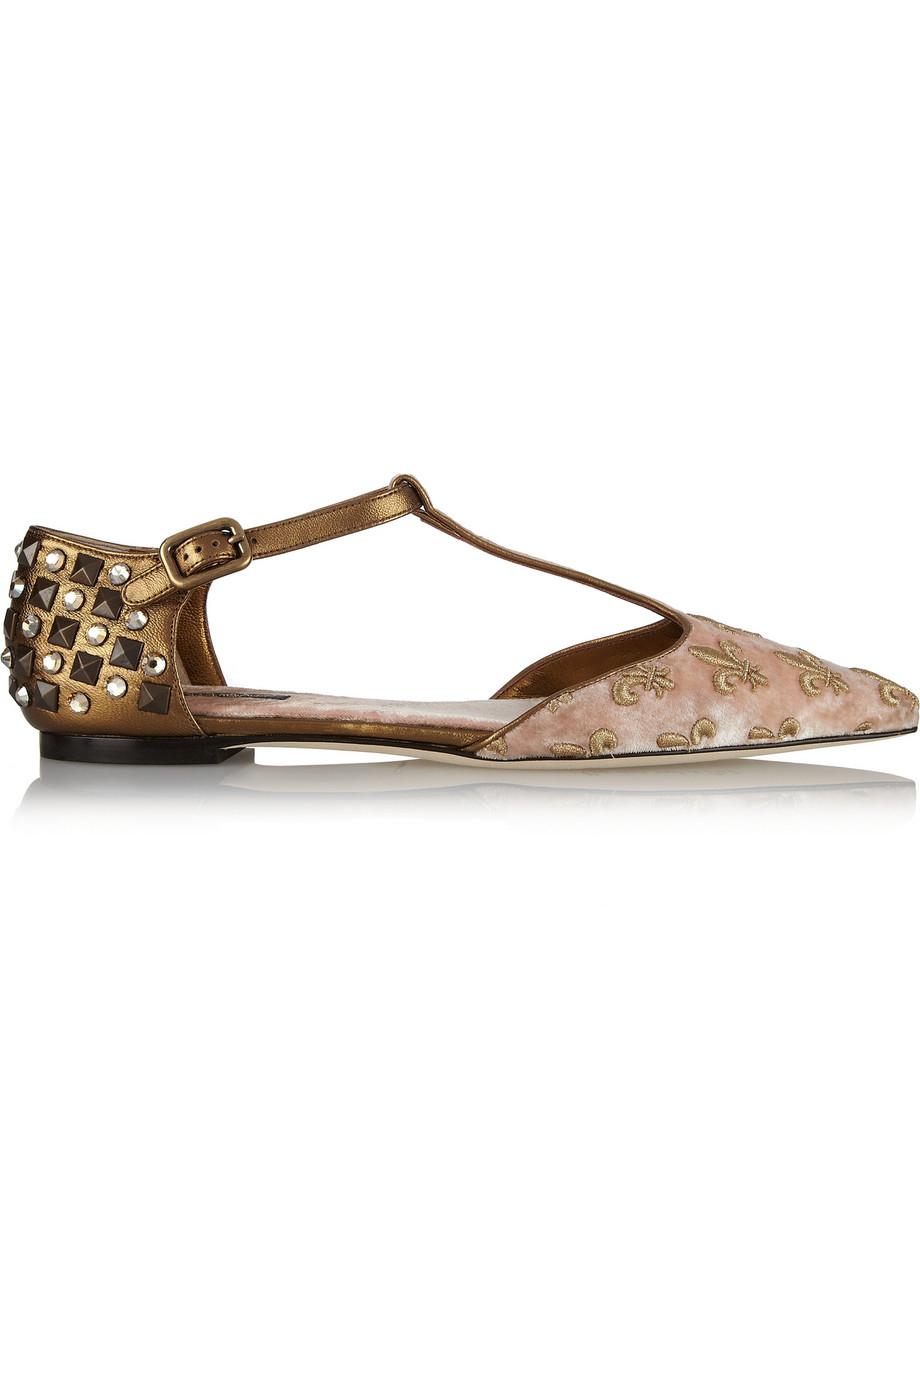 Dolce & Gabbana Leather Flats 1sDS90PY